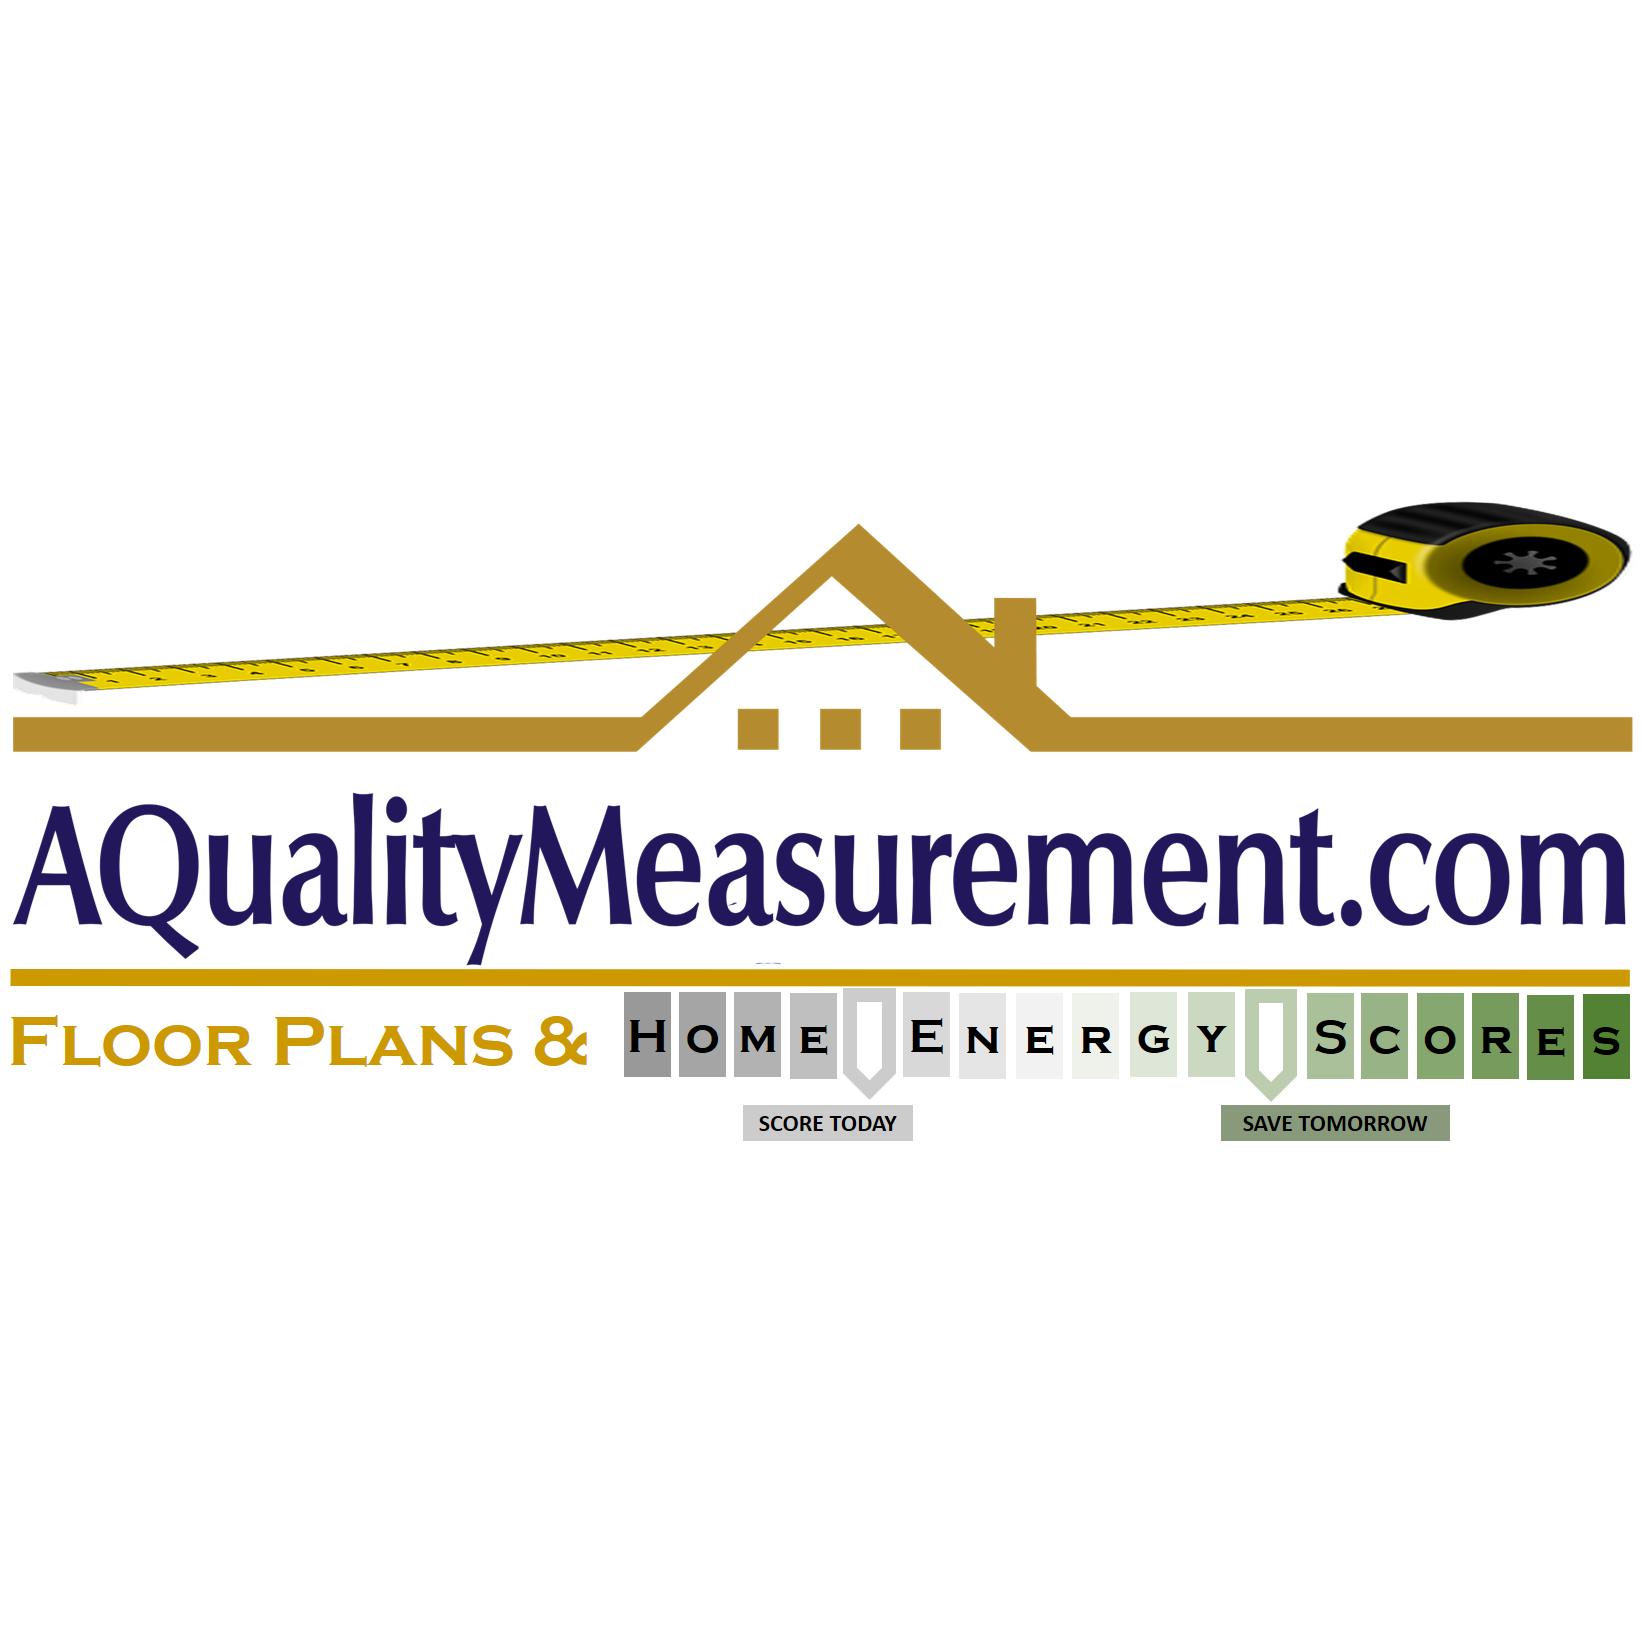 A Quality Measurement